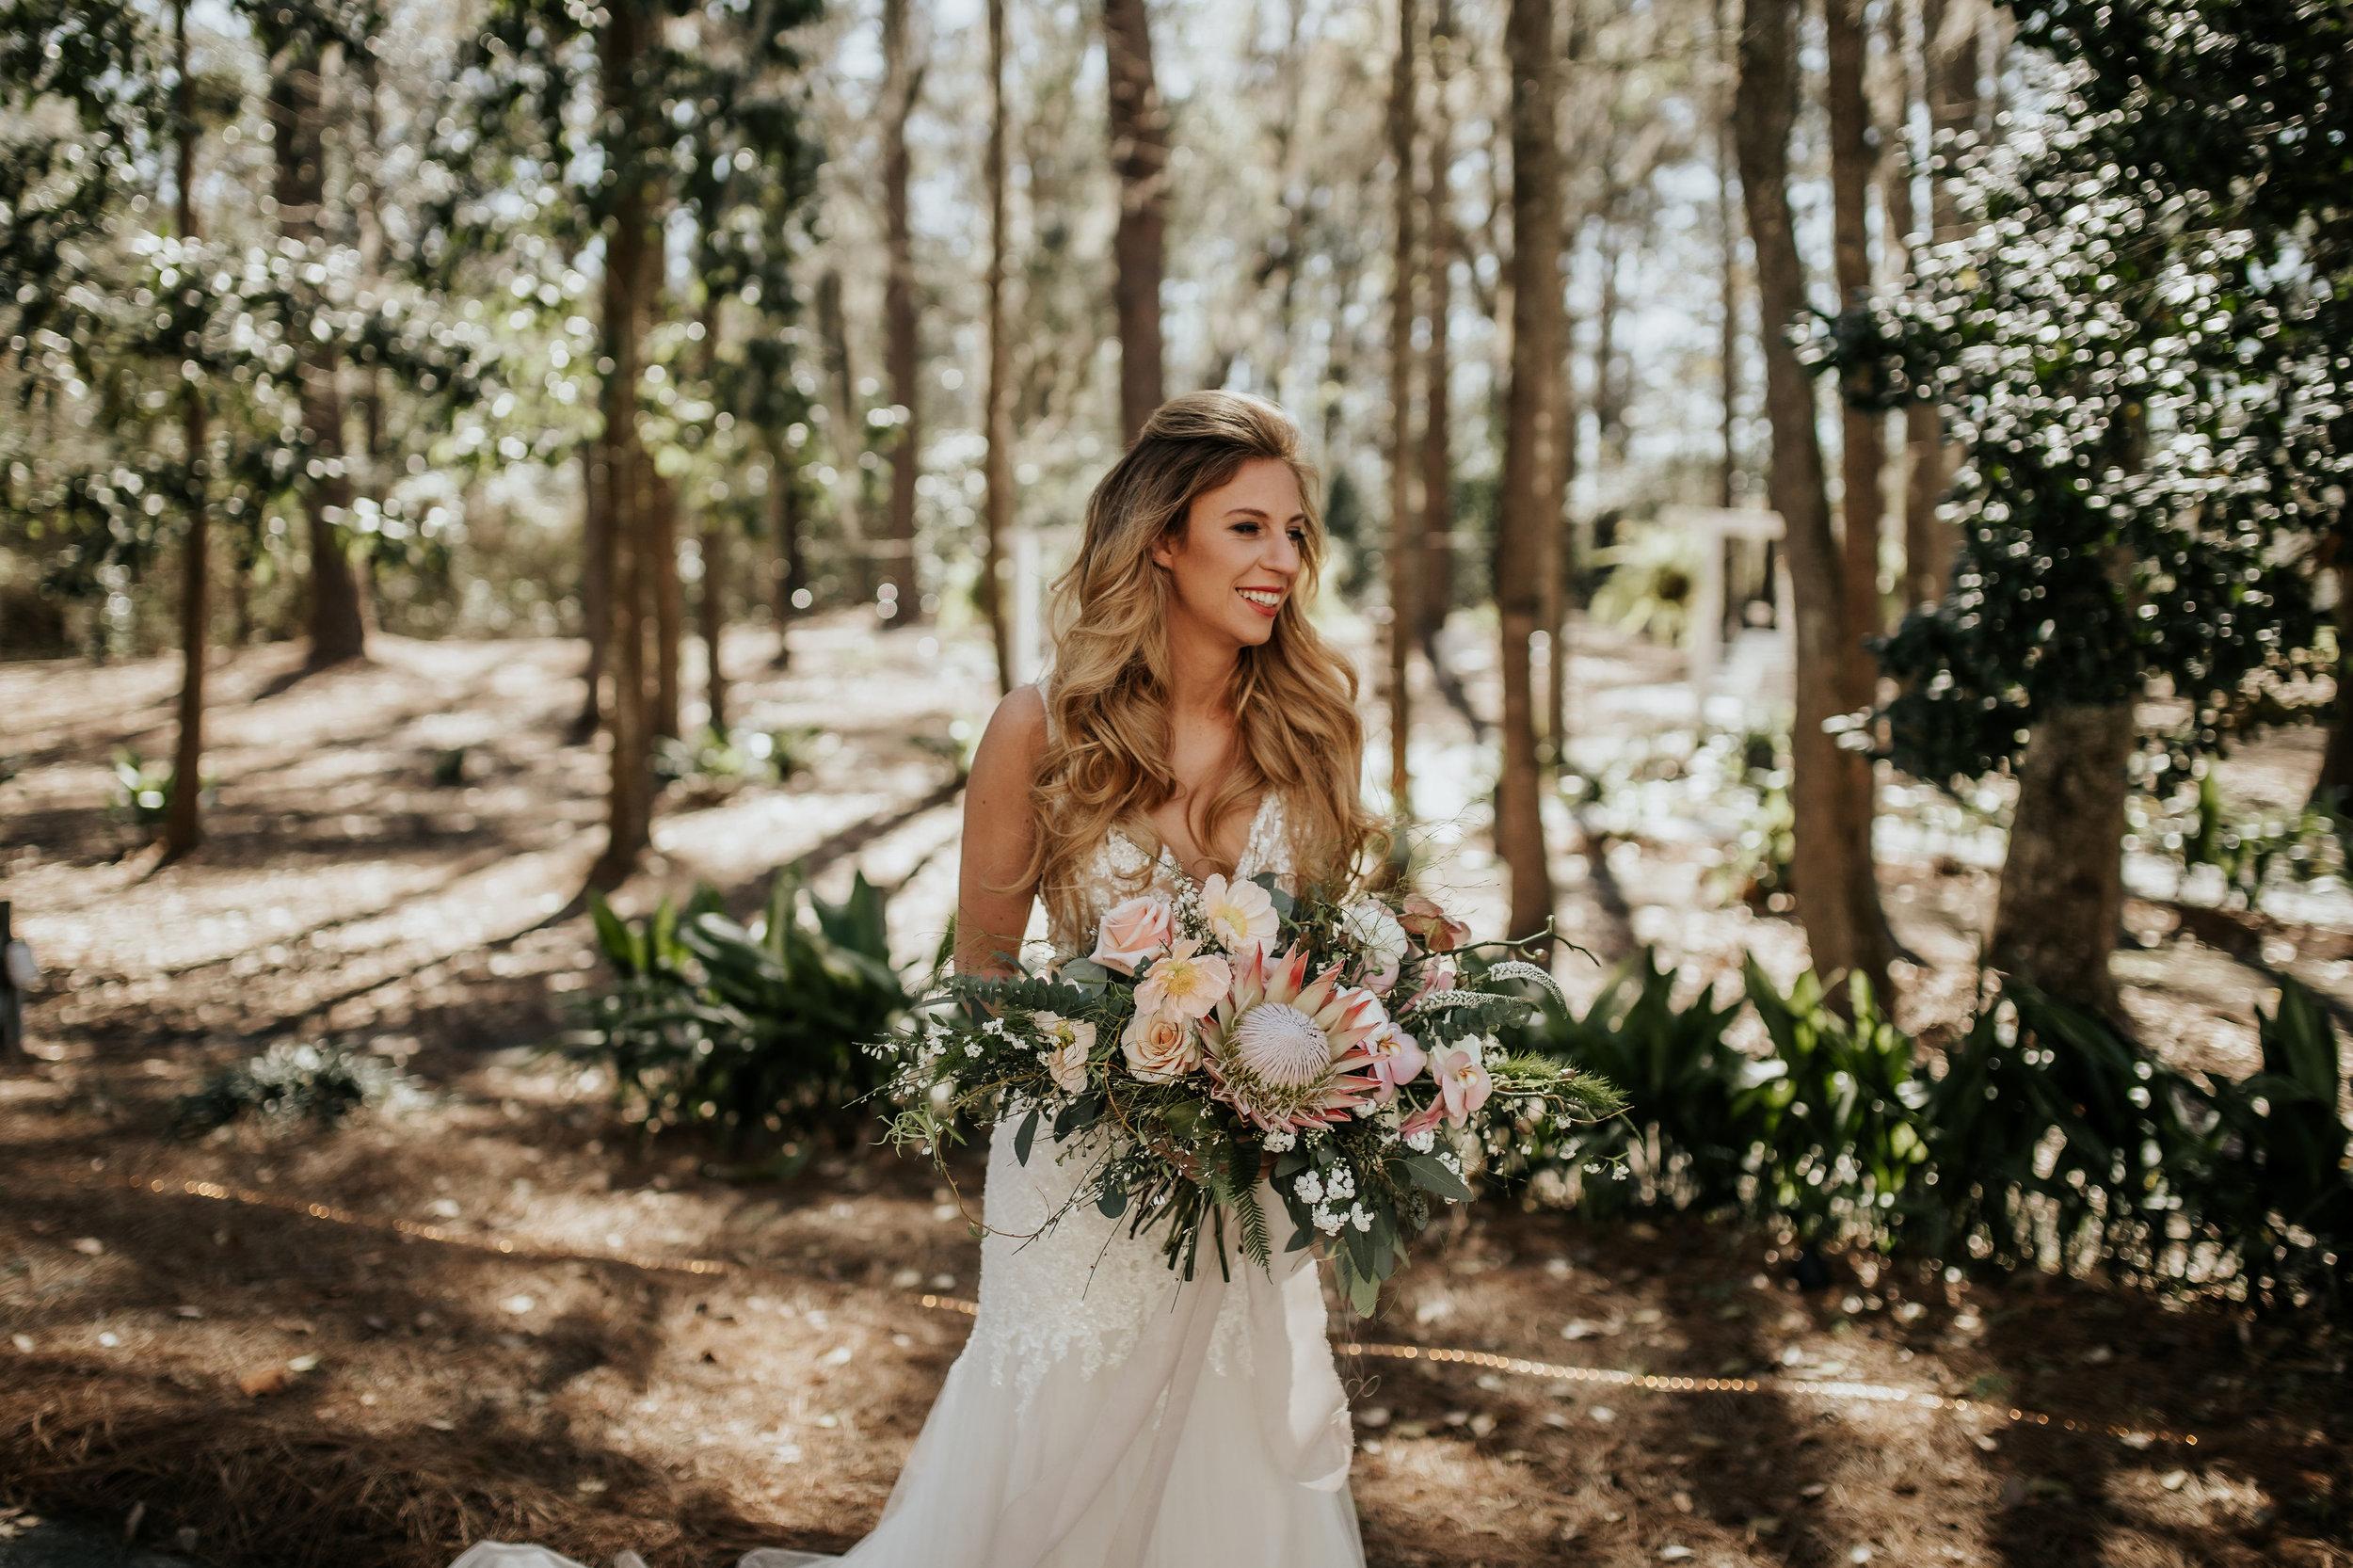 ivory-and-beau-blog-mackey-house-styled-shoot-savannah-wedding-bridal-boutique-savannah-florist-southern-wedding-_G5A1672.jpg